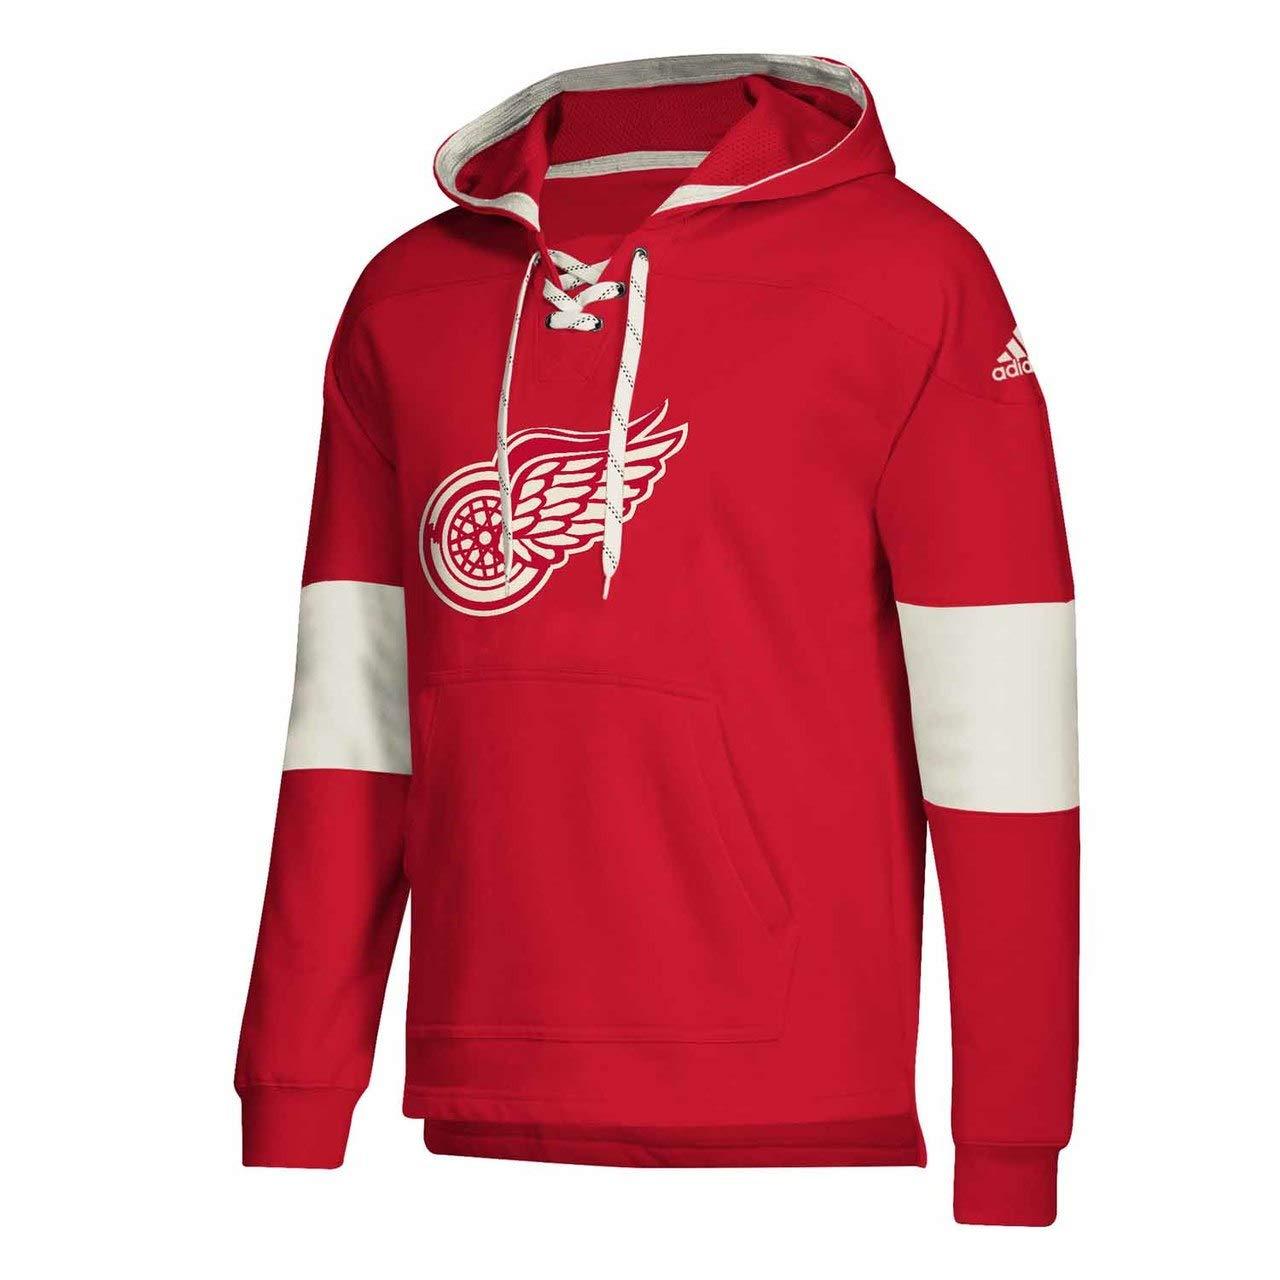 adidas Chicago Blackhawks NHL Men's Crossbar Vintage Jersey Sweatshirt